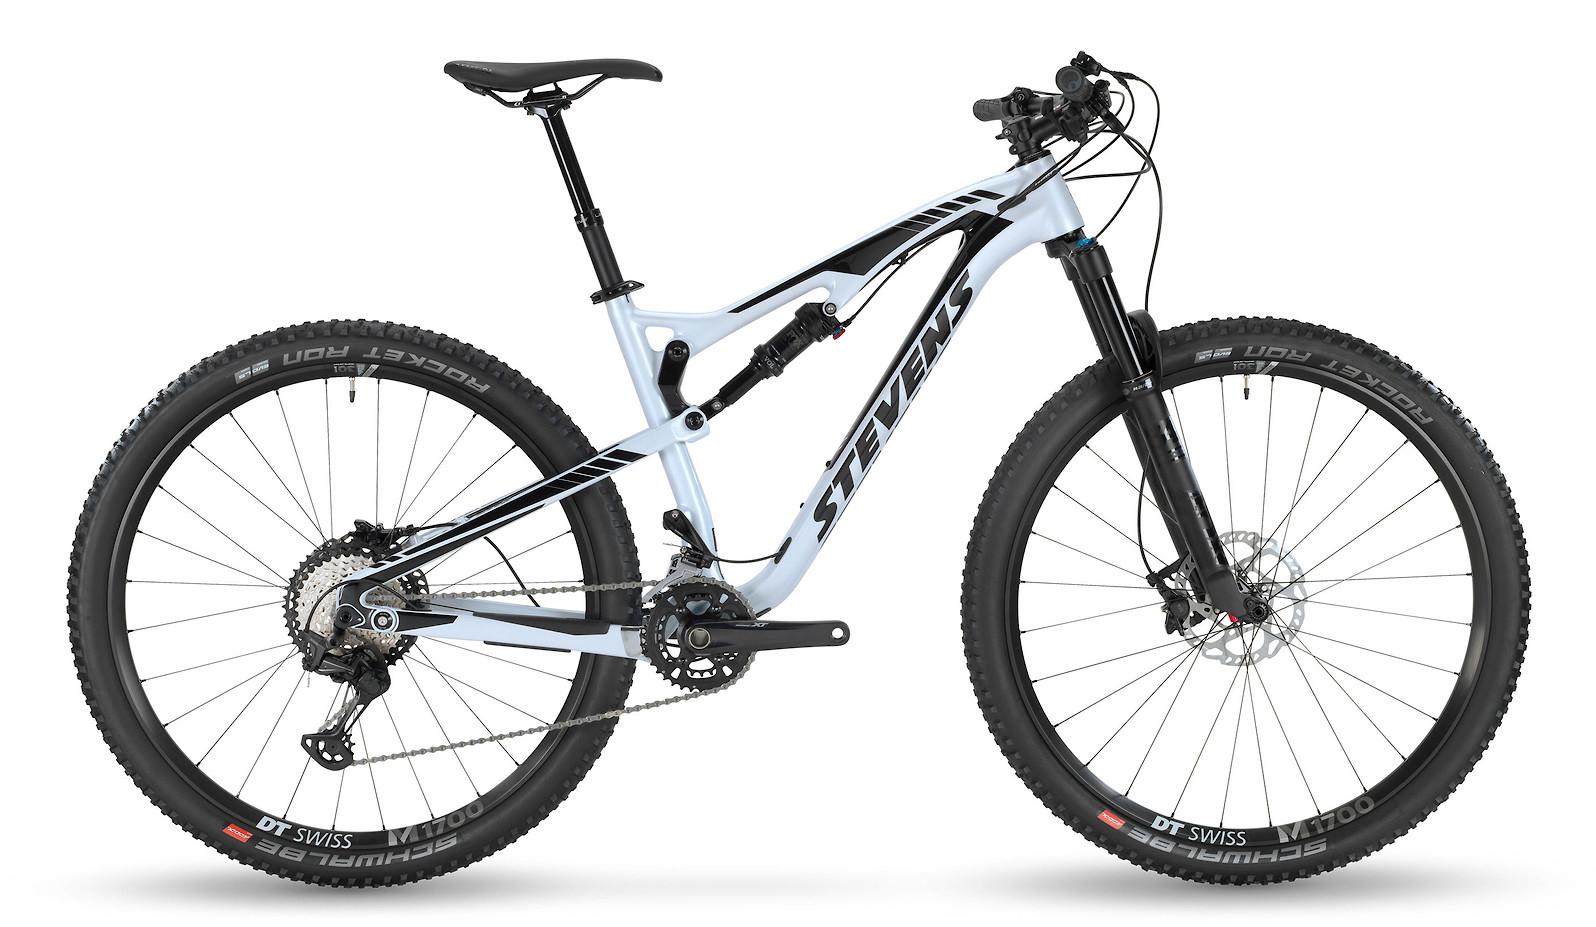 2020 Stevens Jura Carbon ES